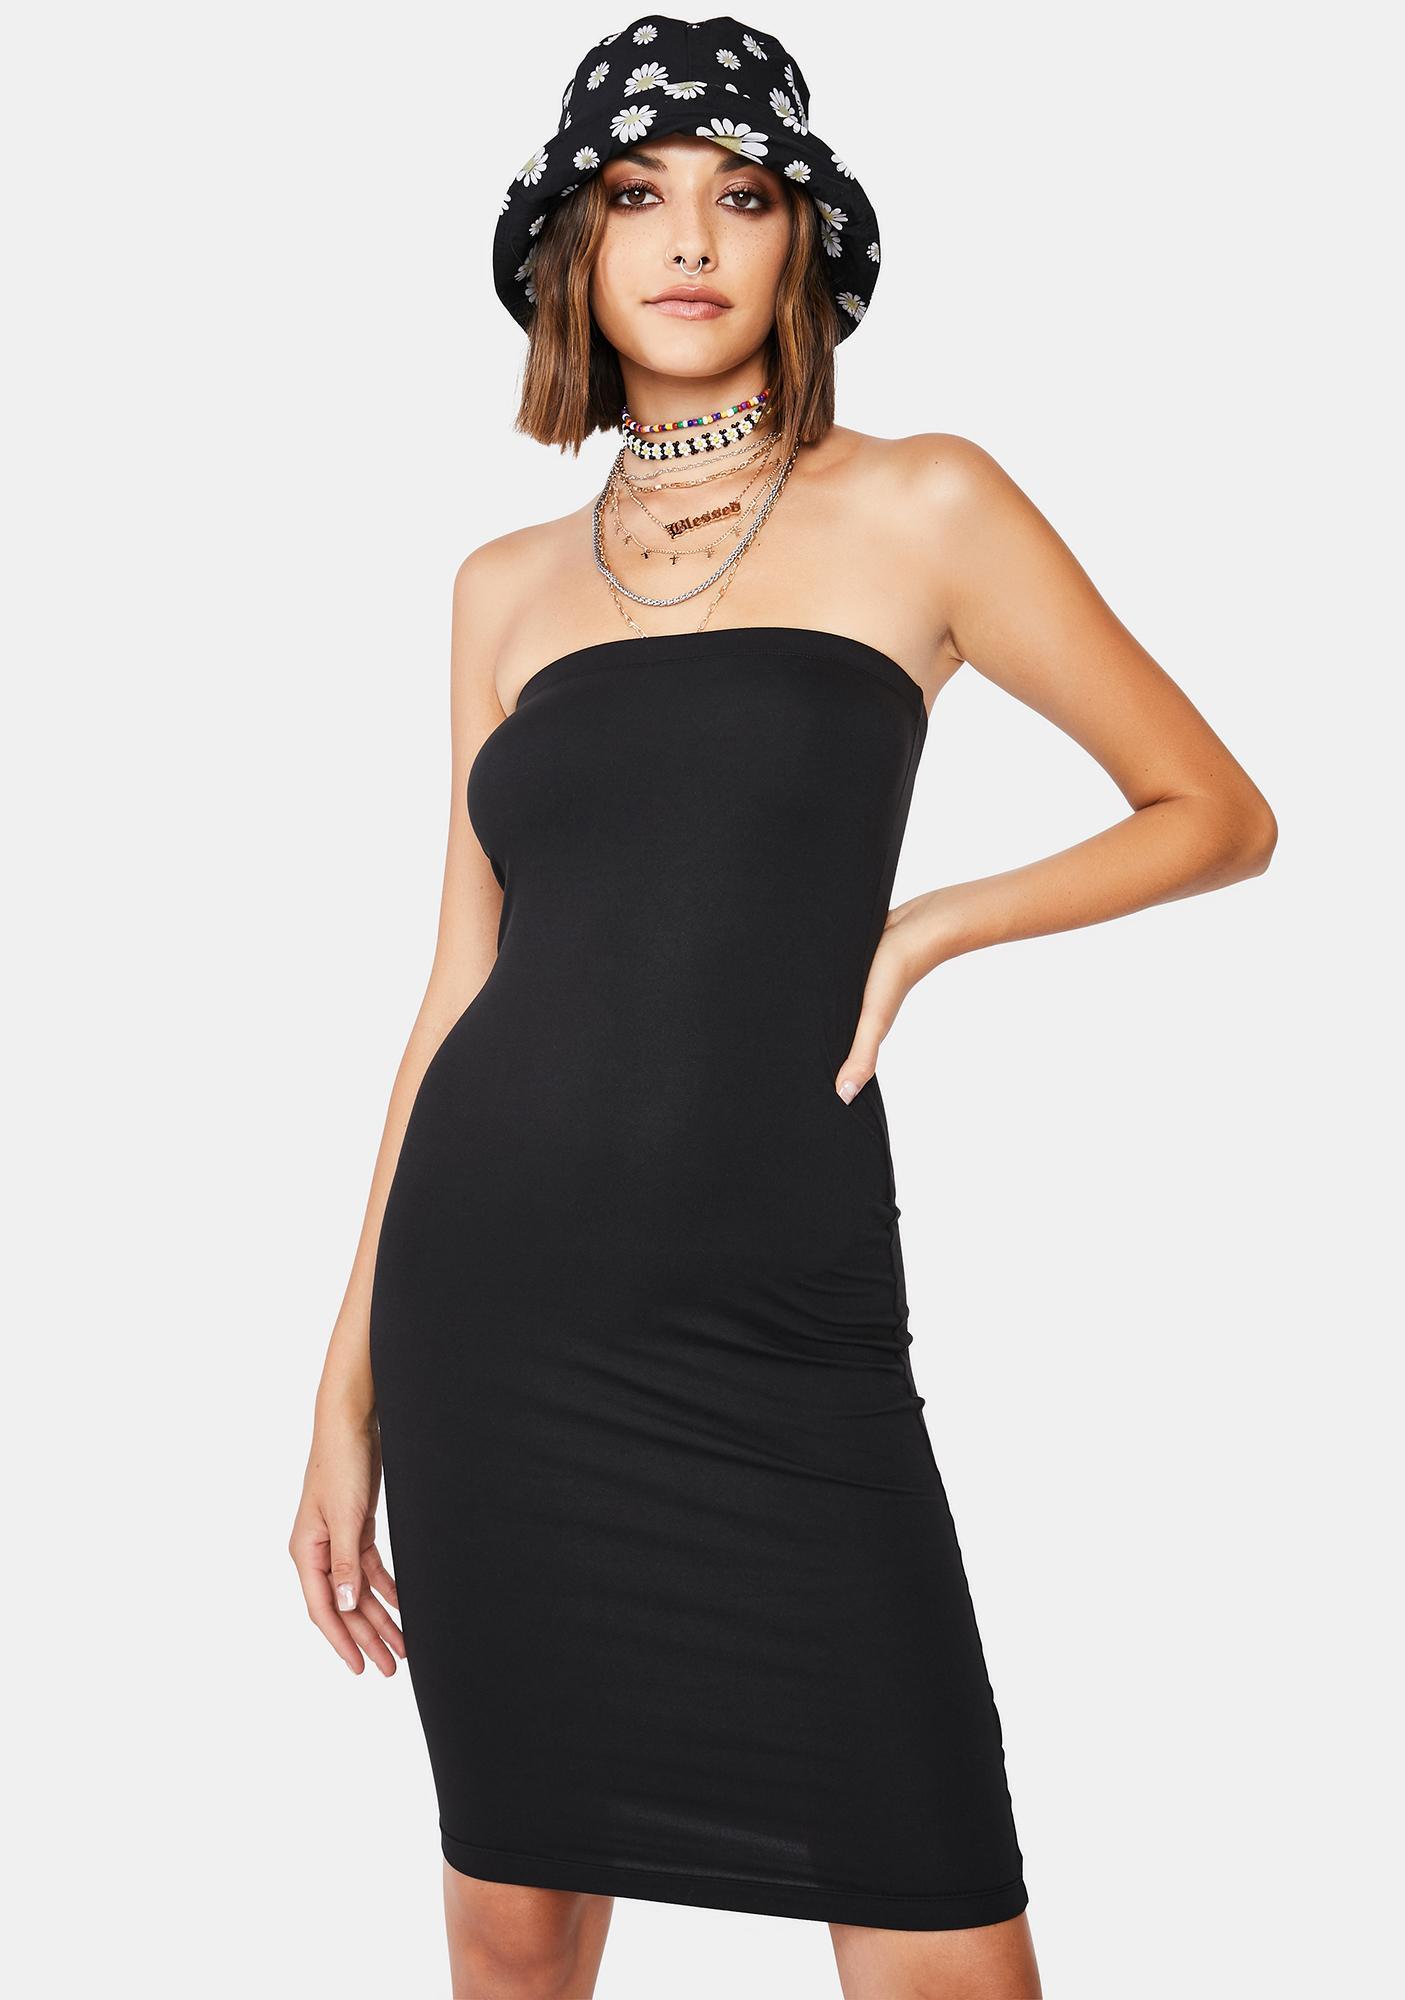 Noir Next Level Babe Tube Dress